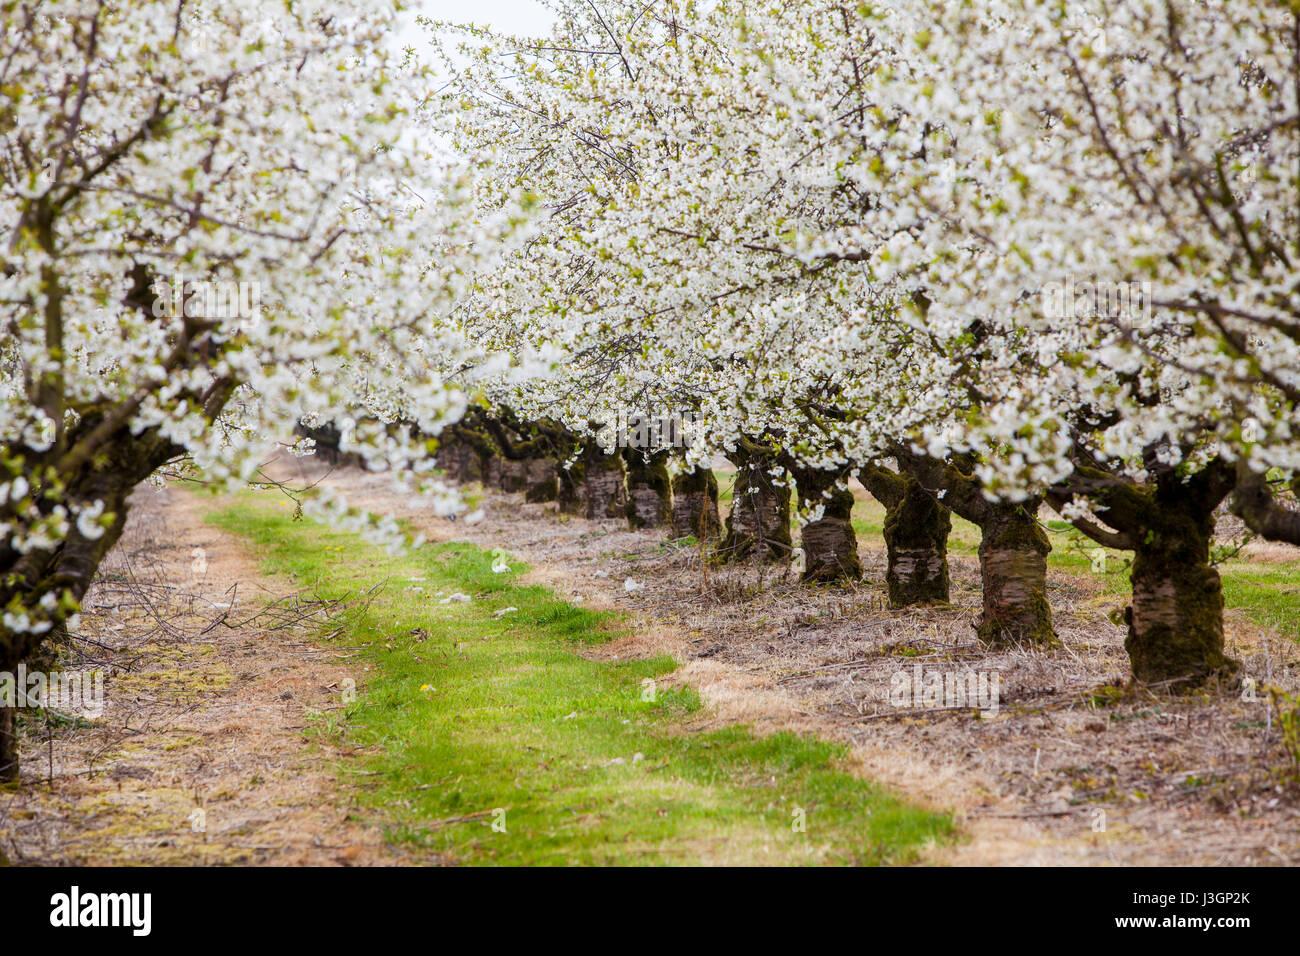 Blühenden Kirschbäume (Prunus SP.) Bäume im Frühling, Weserbergland, Hessen, Deutschland, Europa Stockbild